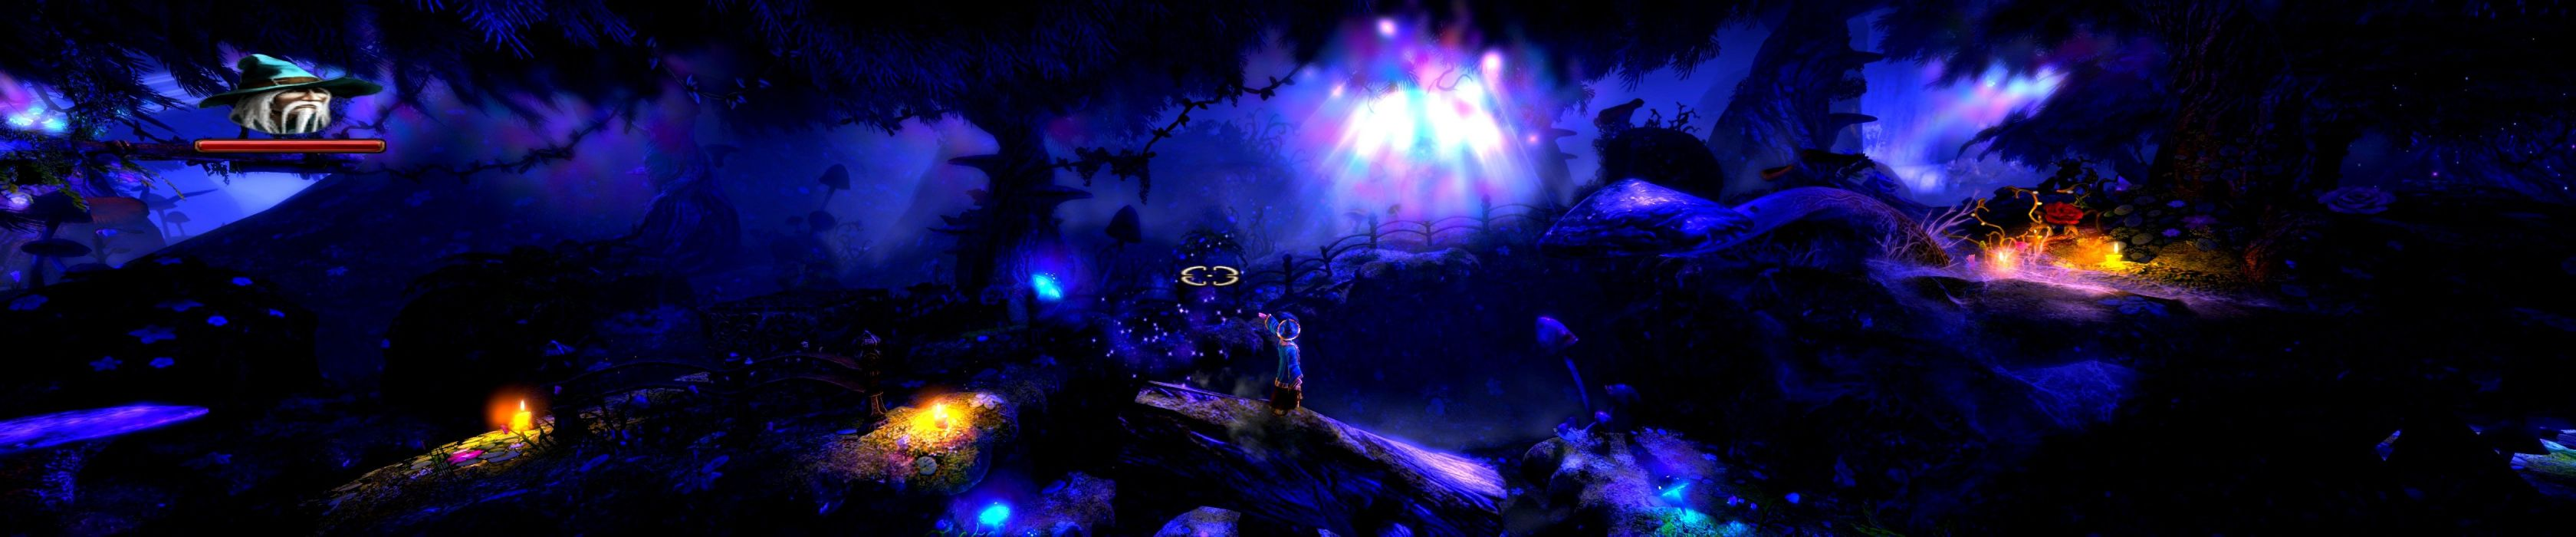 TRINE 2 scrolling fantasy platform action rpg (12) wallpaper